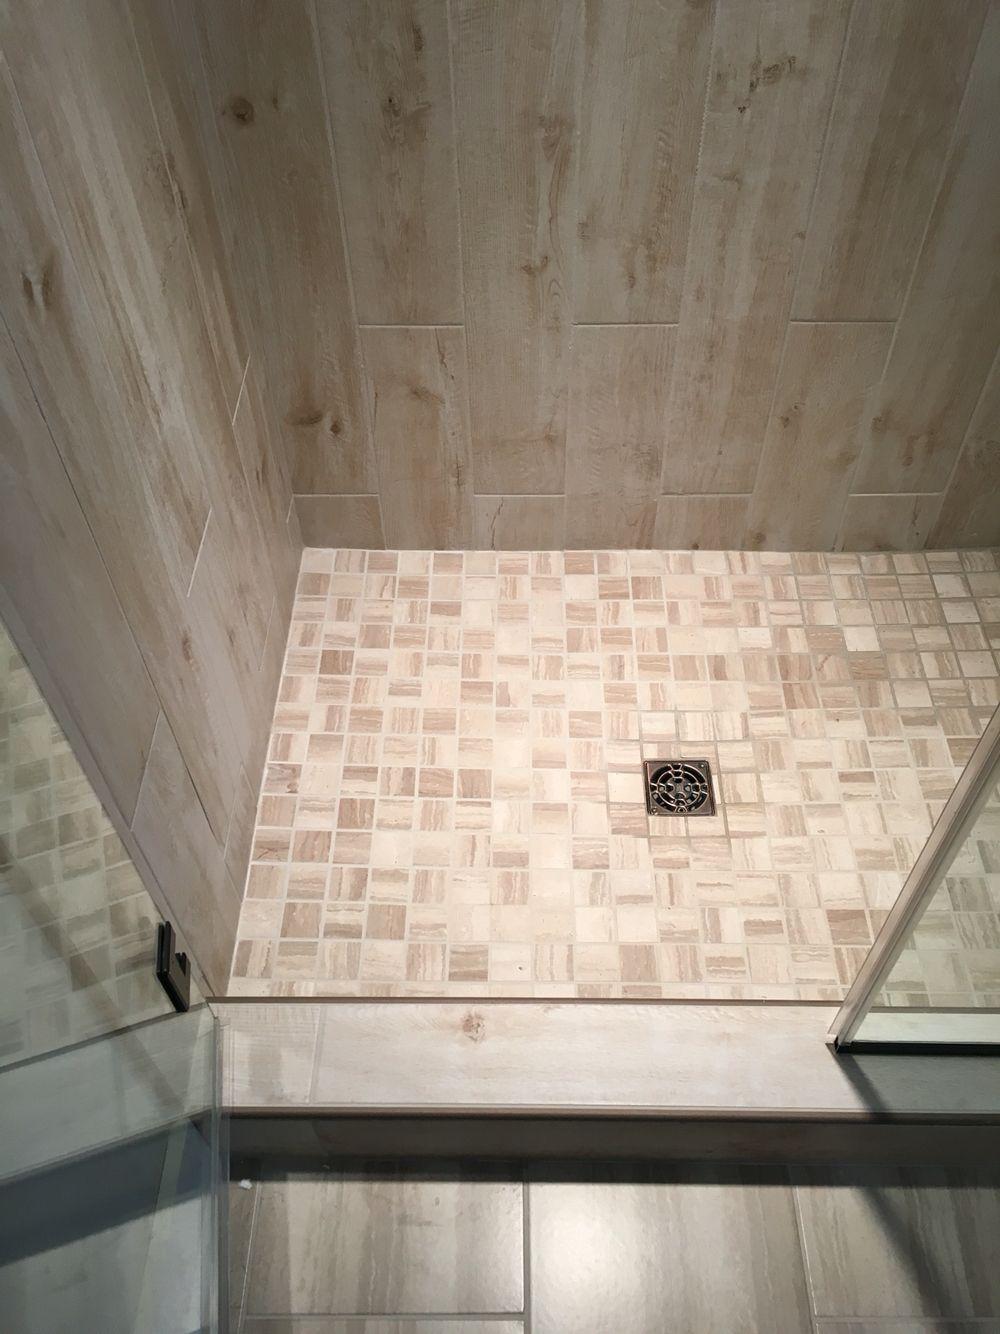 Vertical wood look tile shower superior development llc vertical wood look tile shower superior development llc nashville builder design by dailygadgetfo Choice Image